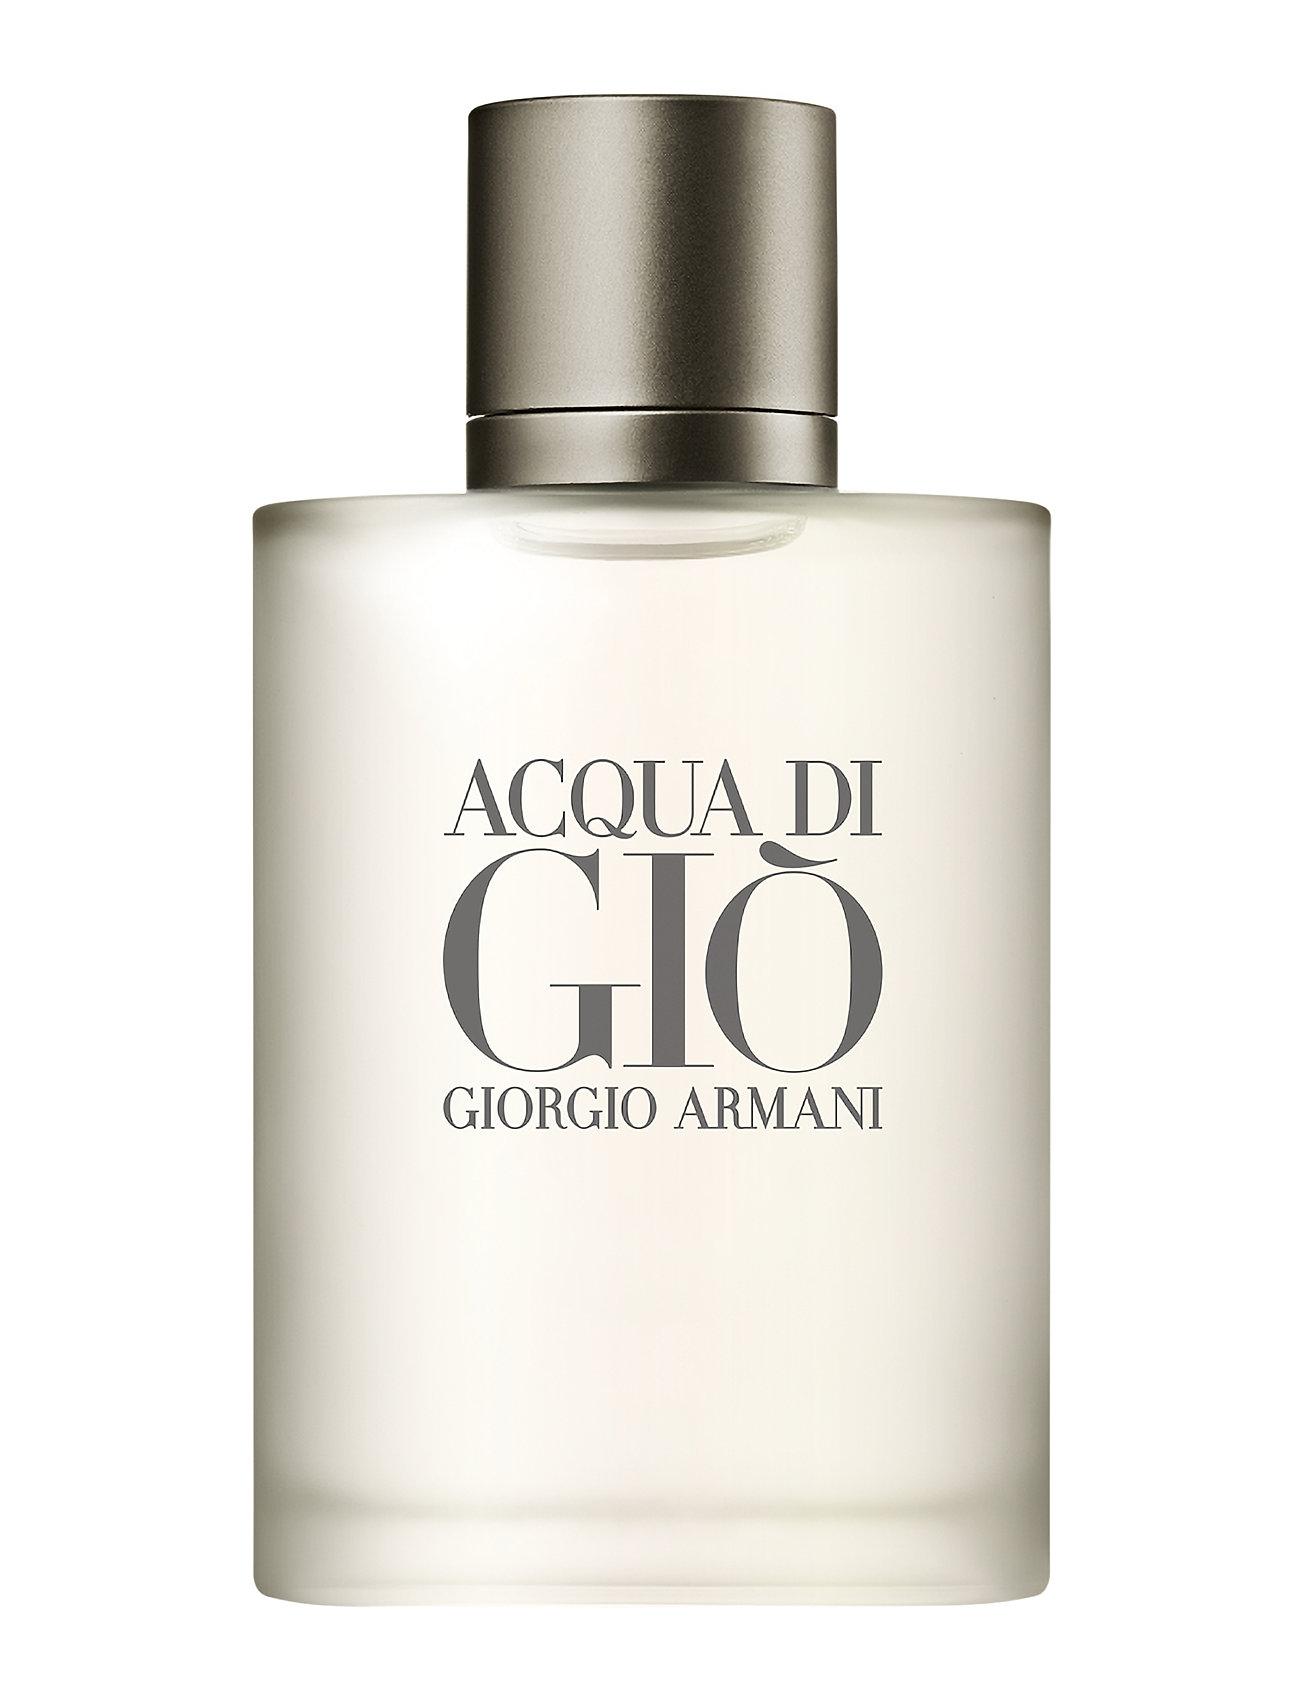 Acqua di giã² pour homme eau de toilette 50 ml fra giorgio armani på boozt.com dk